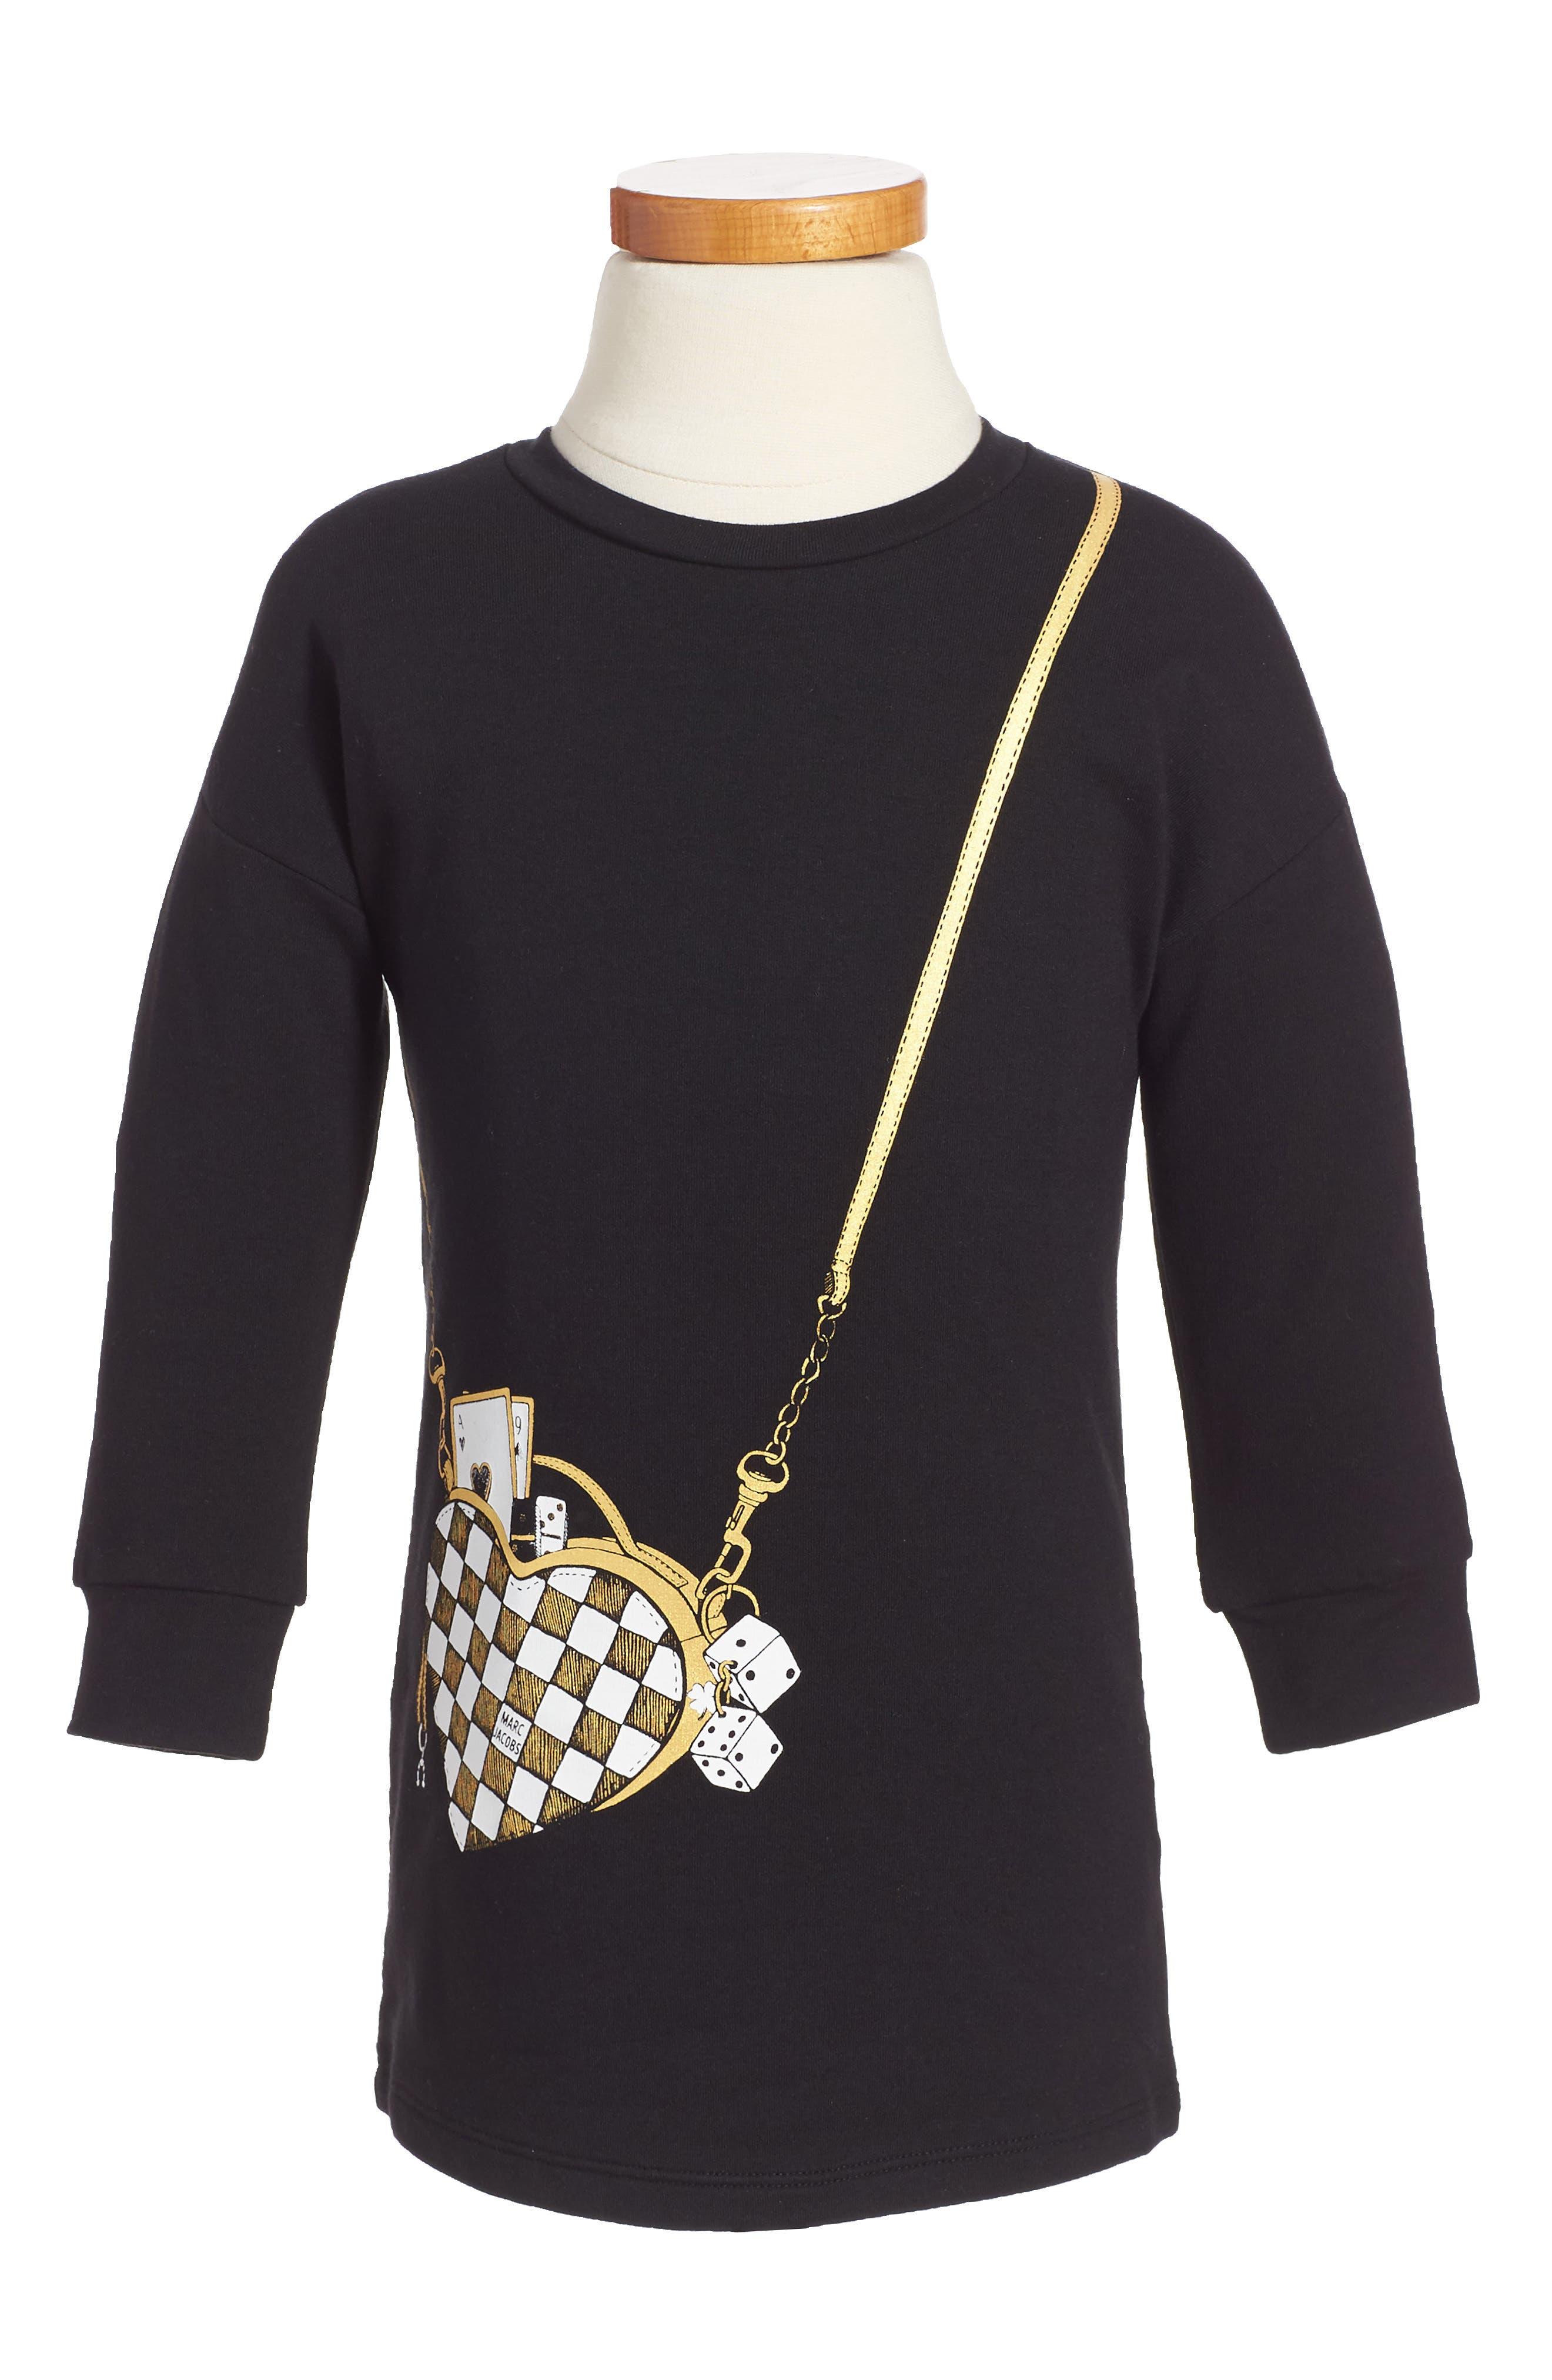 Trompe L'Oeil Sweatshirt Dress,                         Main,                         color, Black